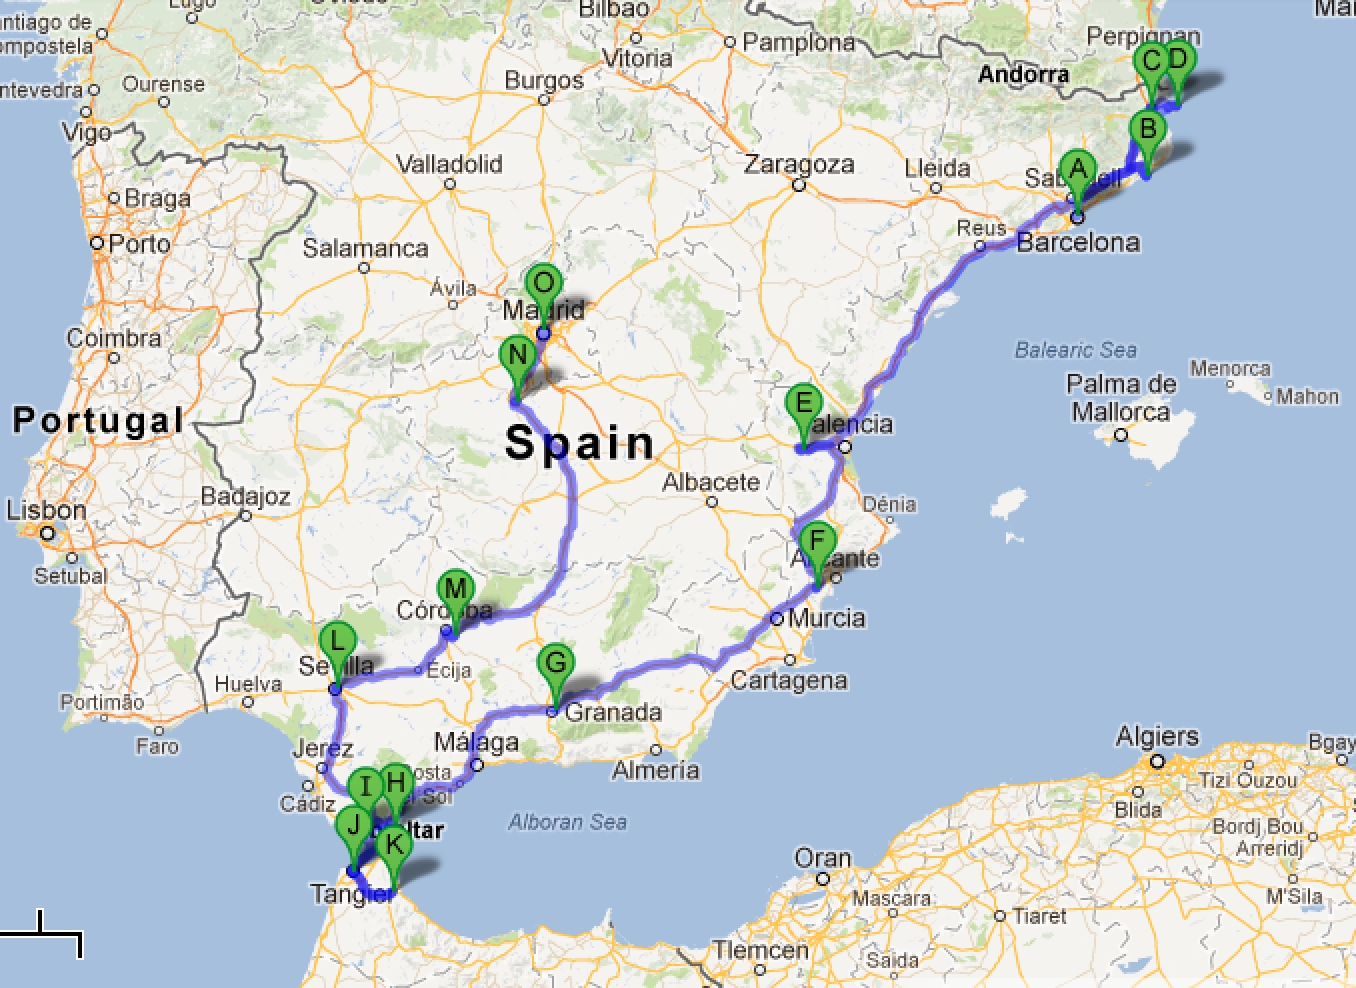 spaingibraltarmorocco road trip Road Trips Pinterest Road